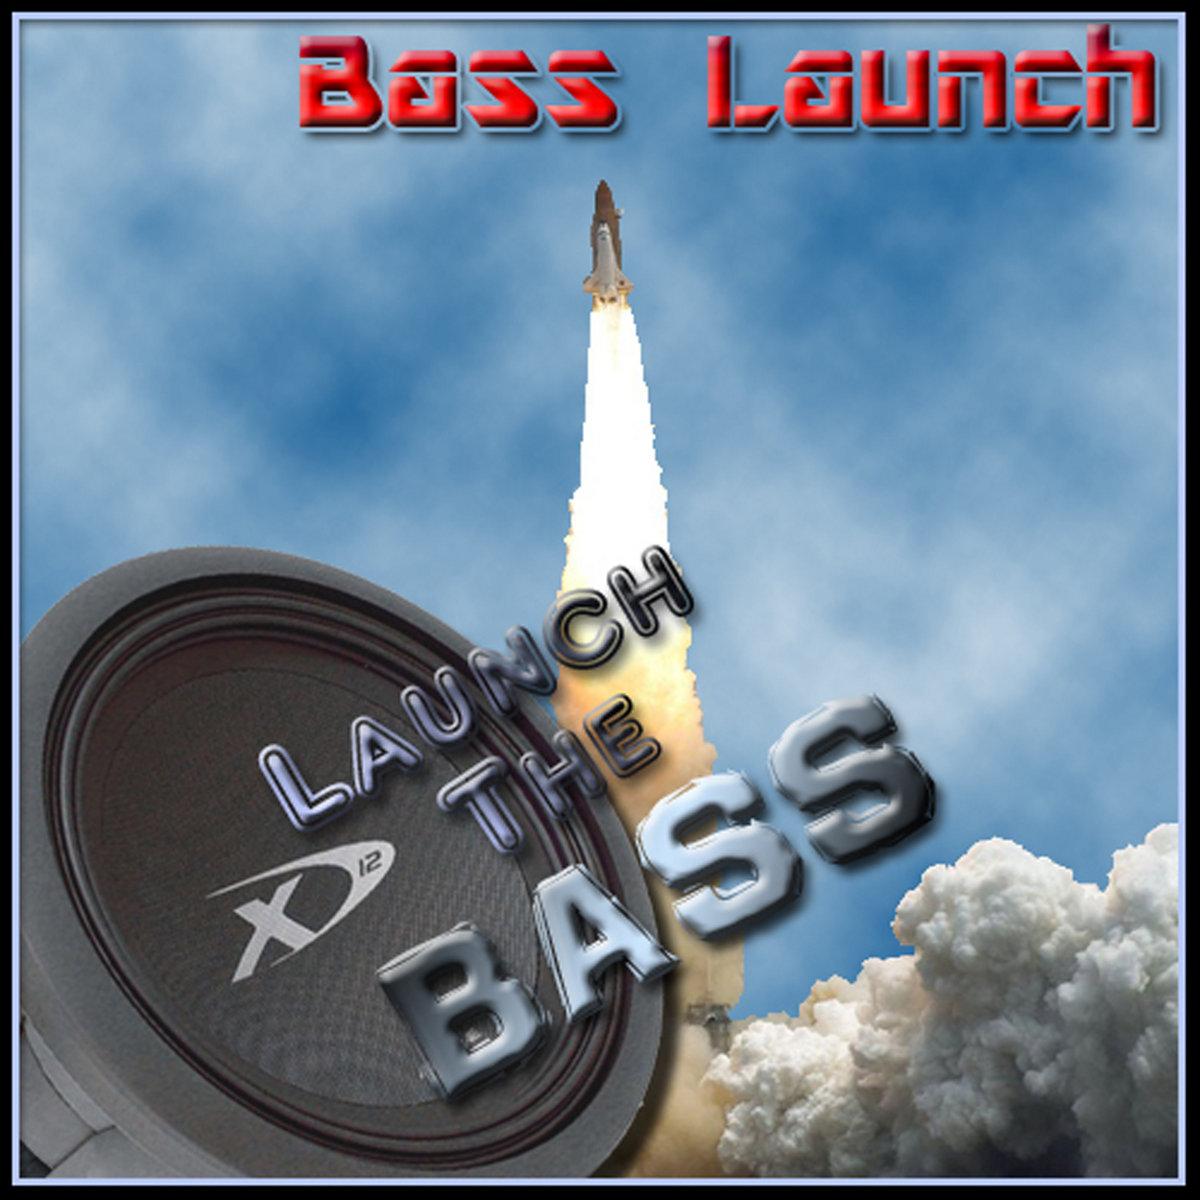 bass mekanik free download mp3